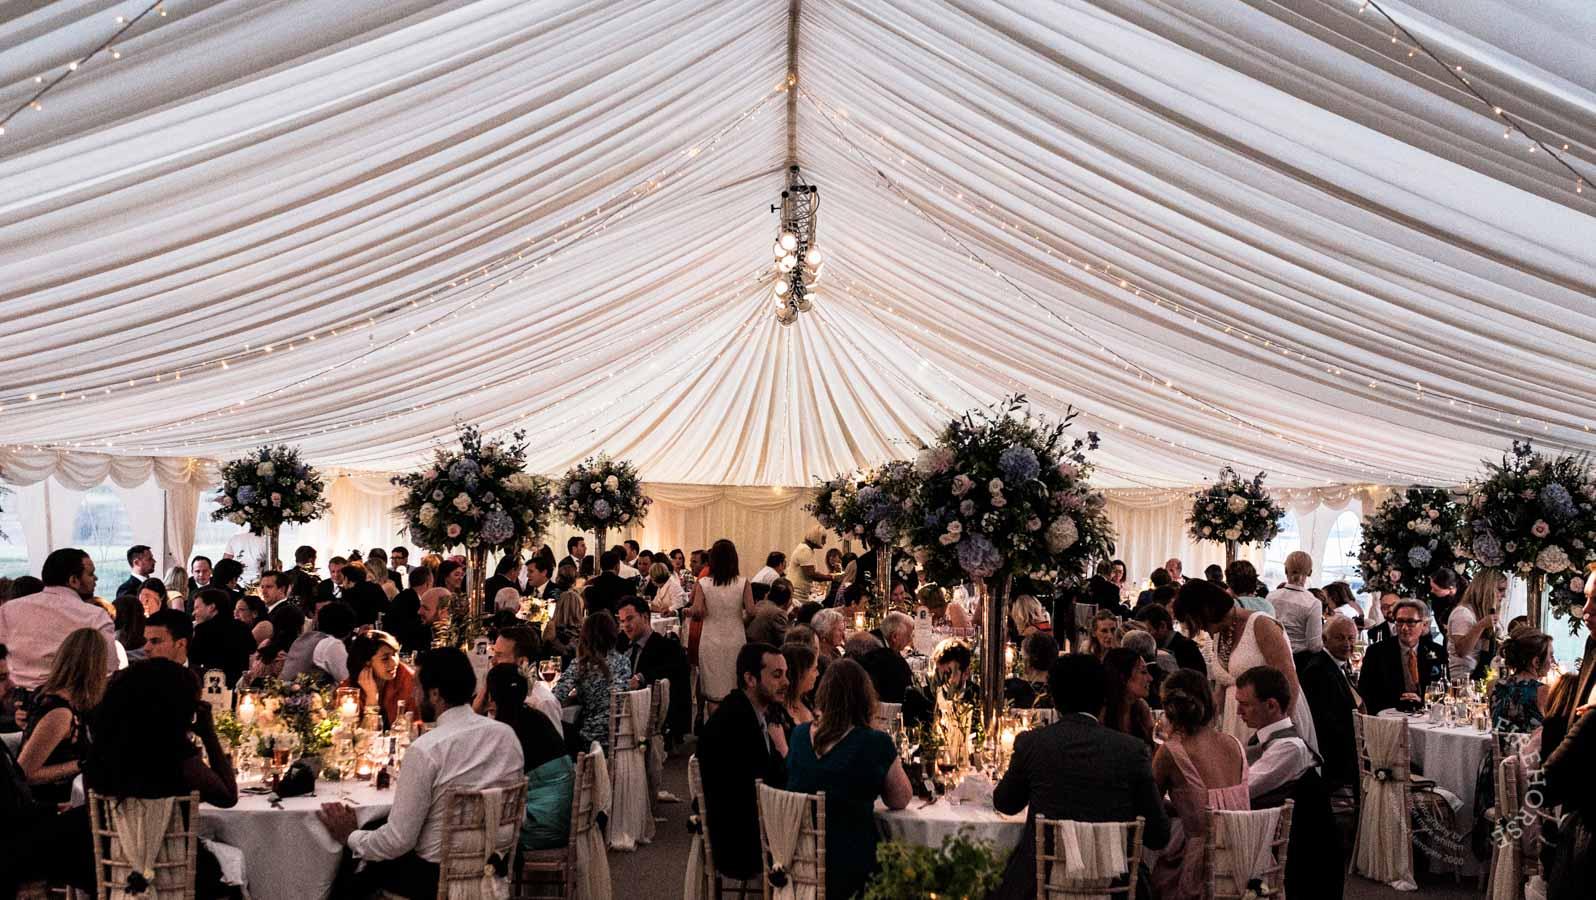 Driffield-Marquee-Wedding-149